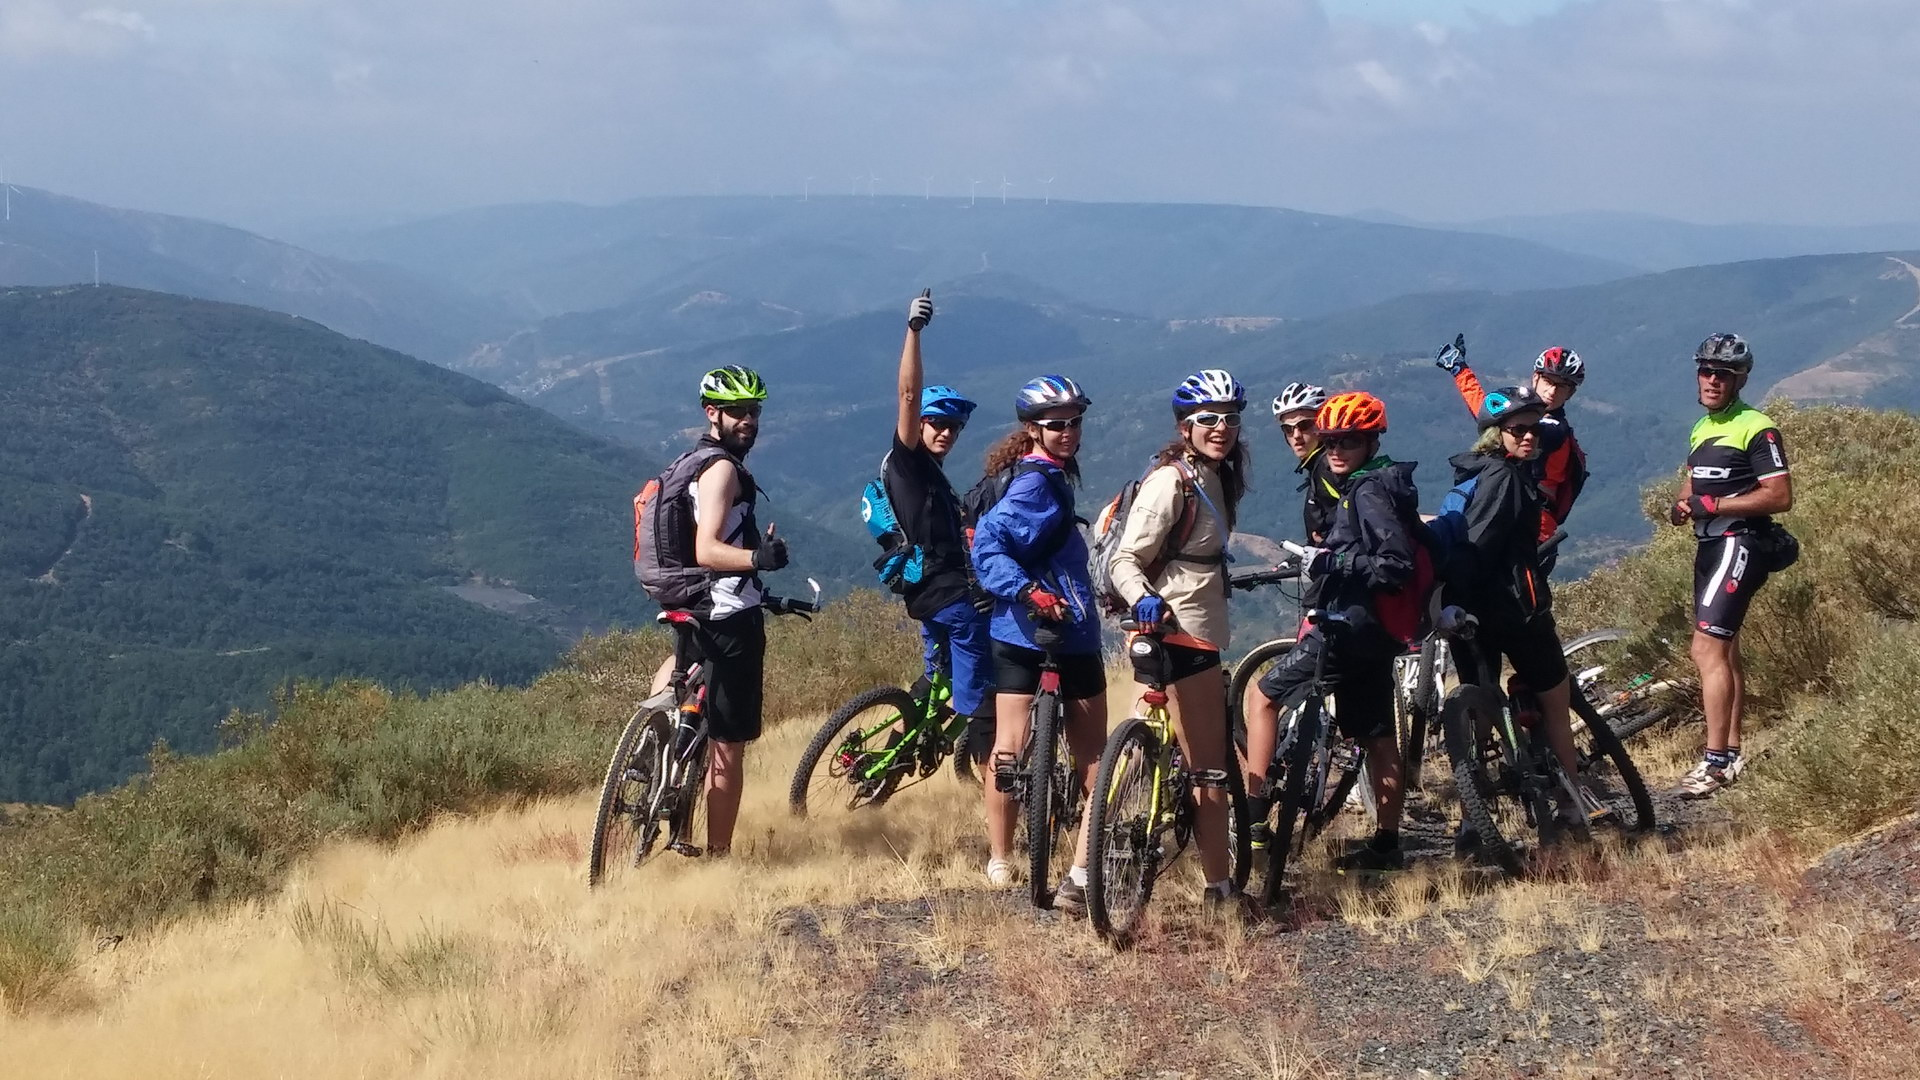 Campamentos de verano en España para ninos jovenes adolescentes bicicleta mountain bike León